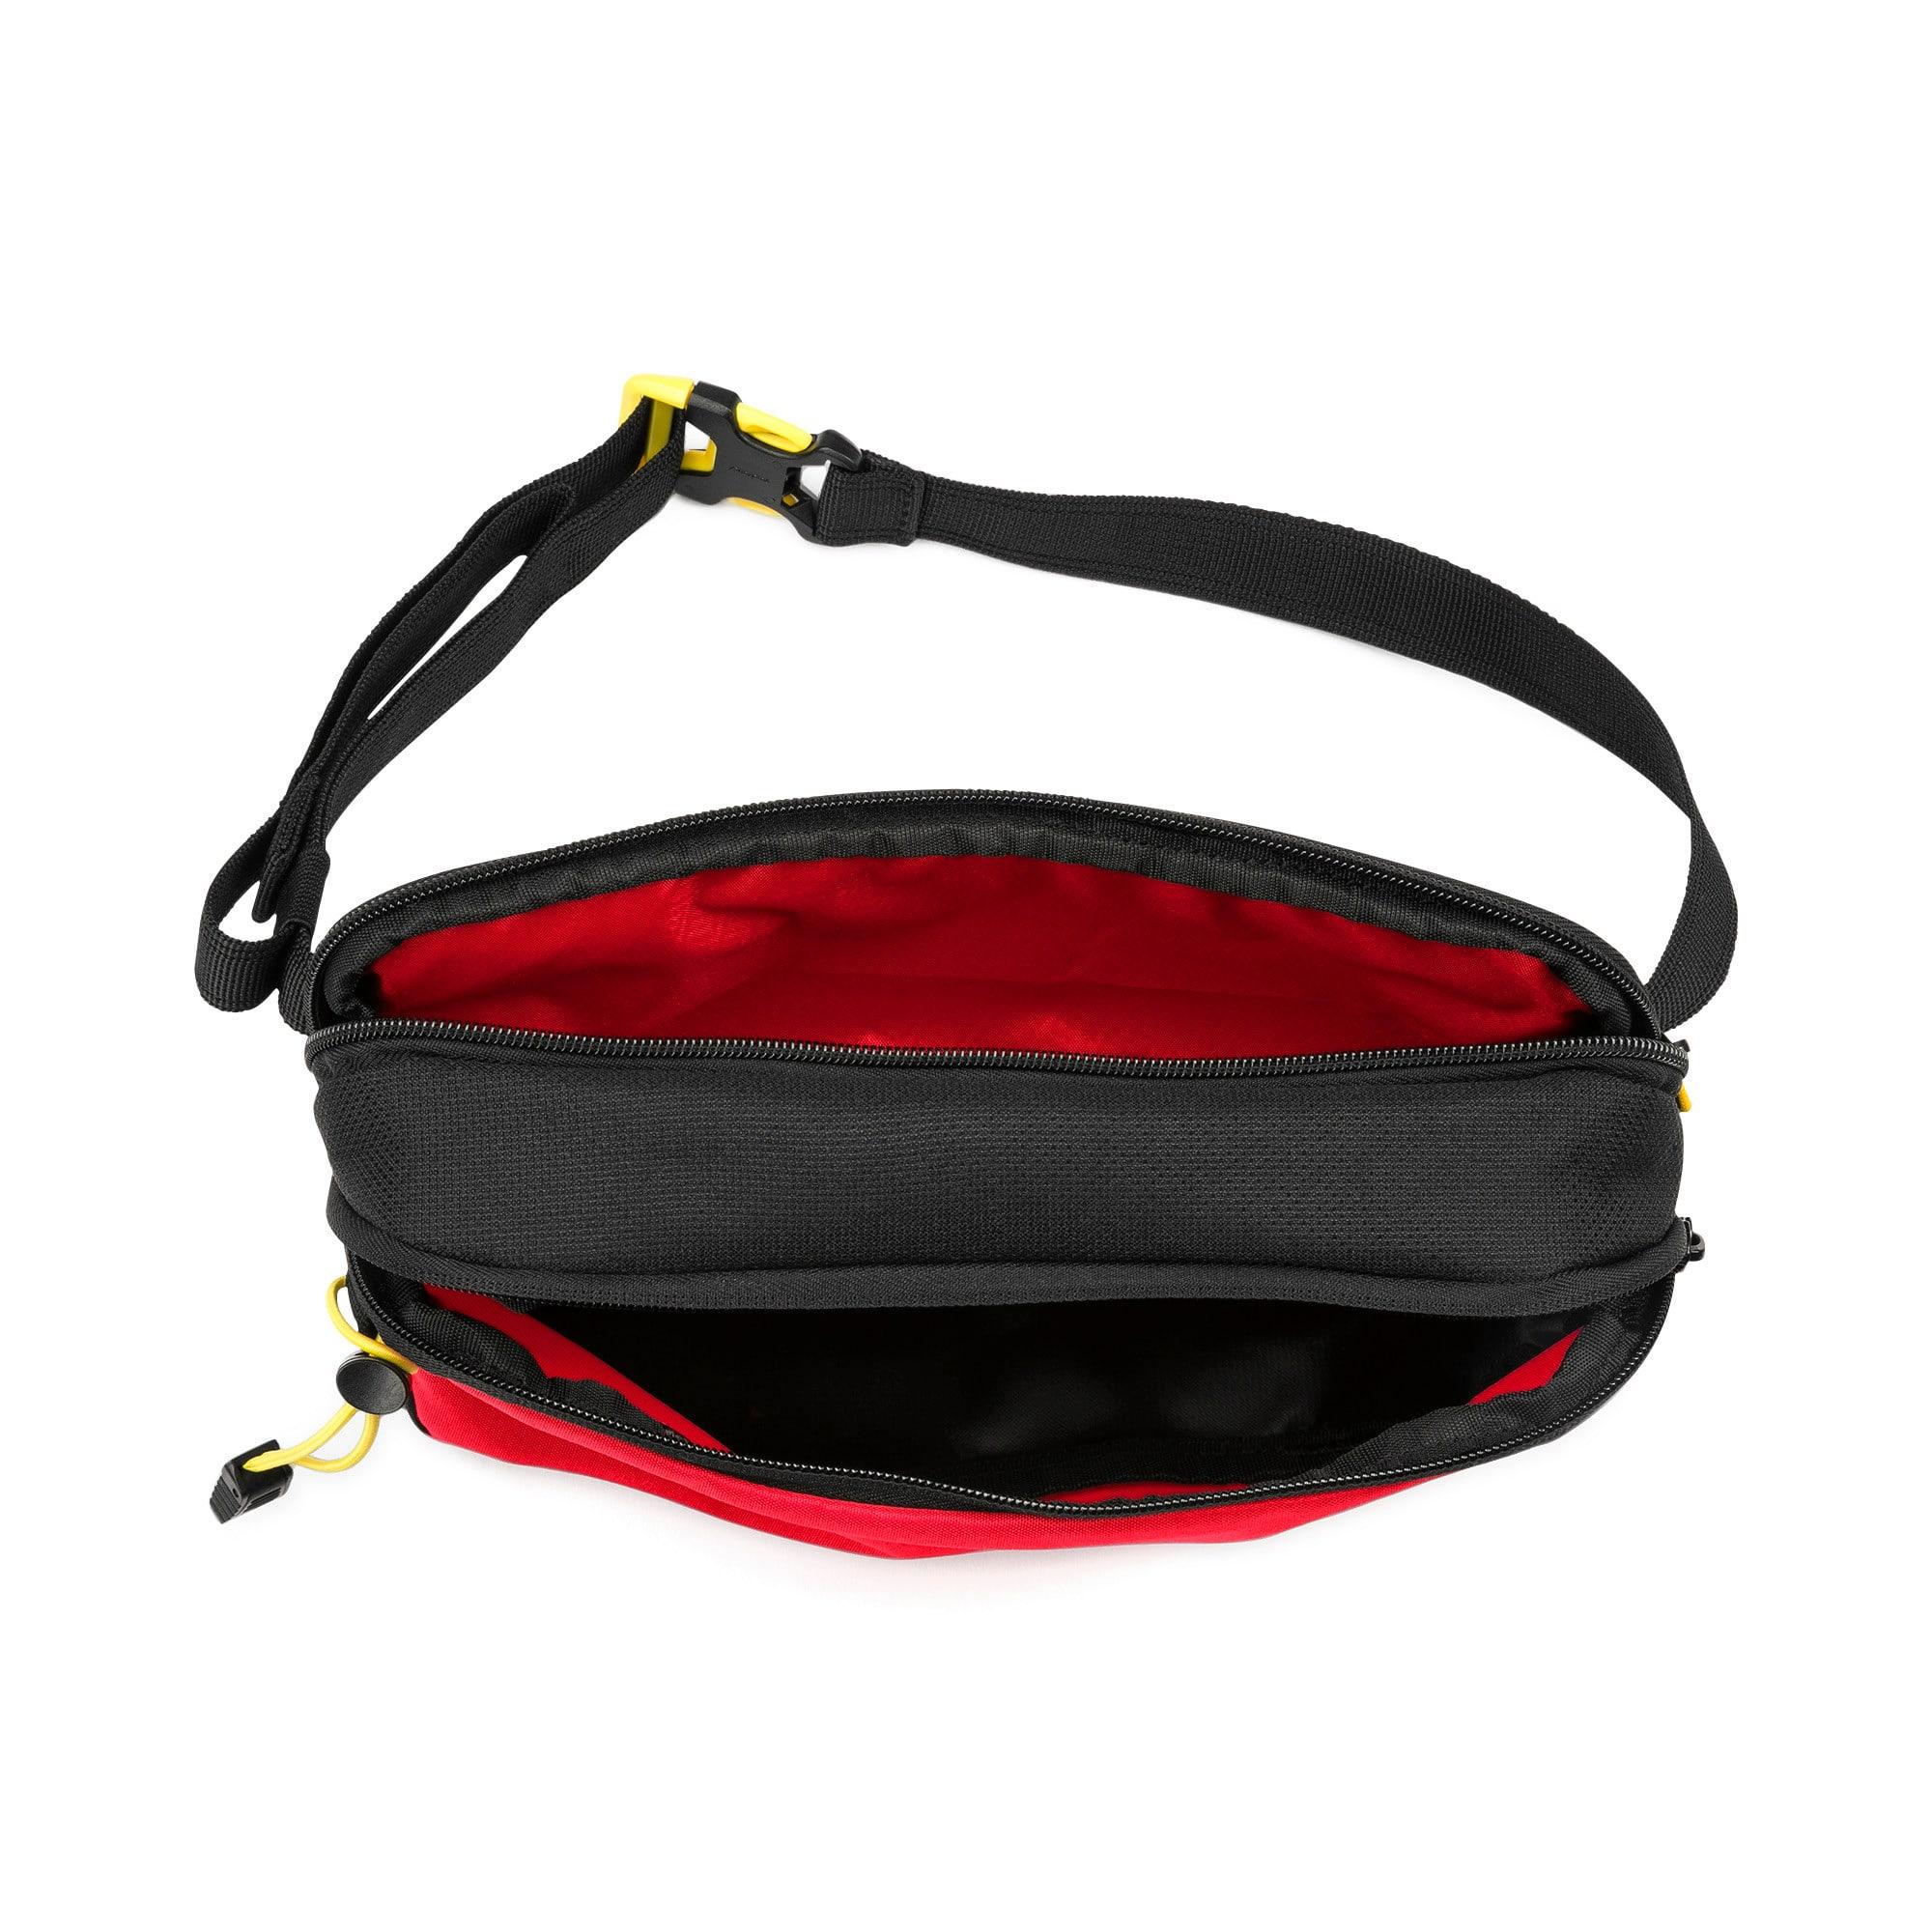 Thumbnail 3 of Scuderia Ferrari Fanwear Waist Bag, Rosso Corsa, medium